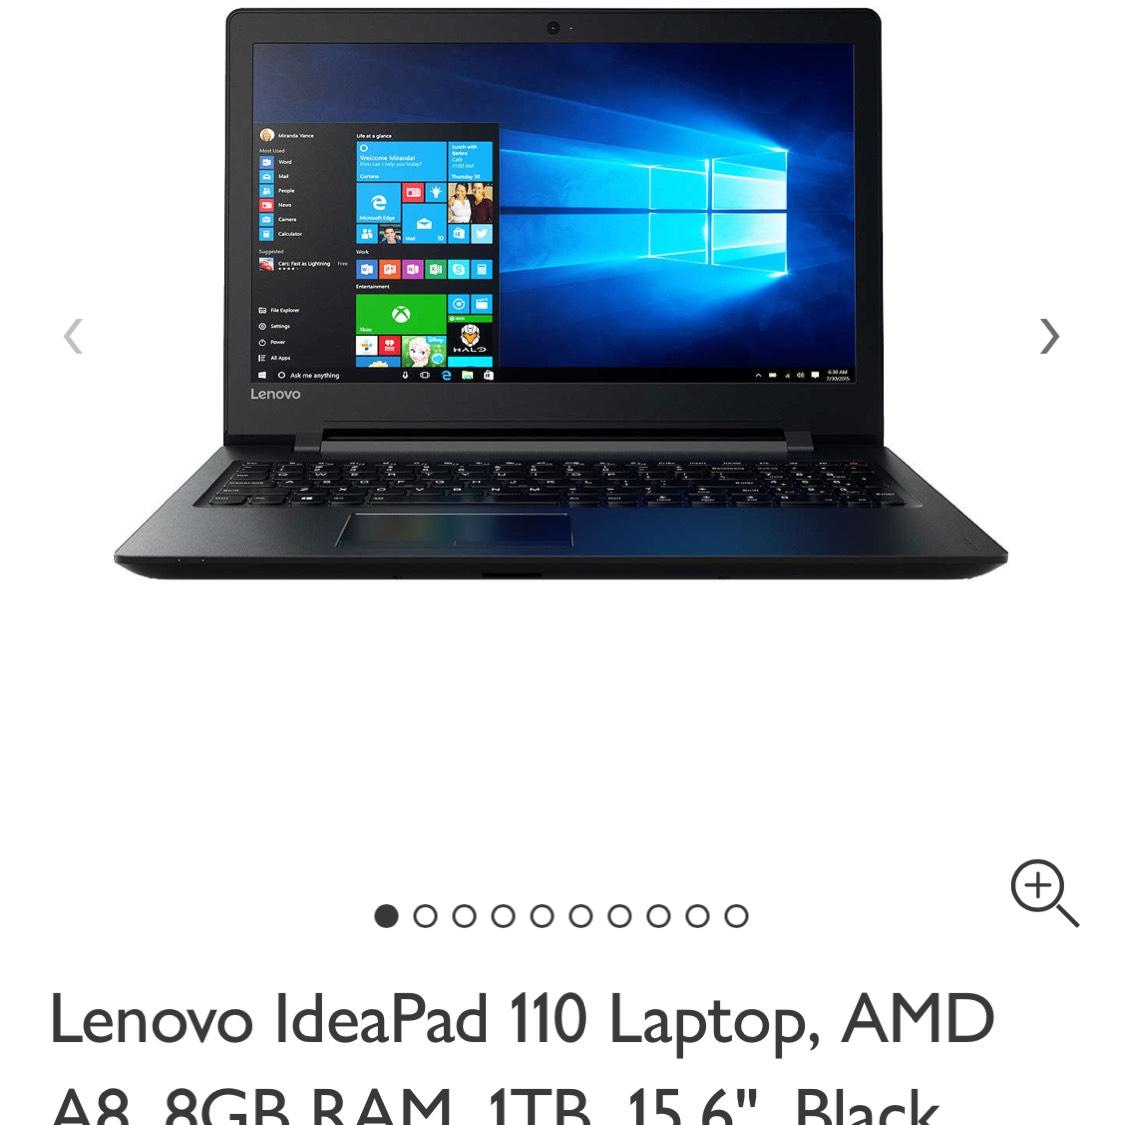 Lenovo IdeaPad 110 Laptop £274.99 John Lewis 8gb Ram 1TB HDD - £274.99 @ John Lewis